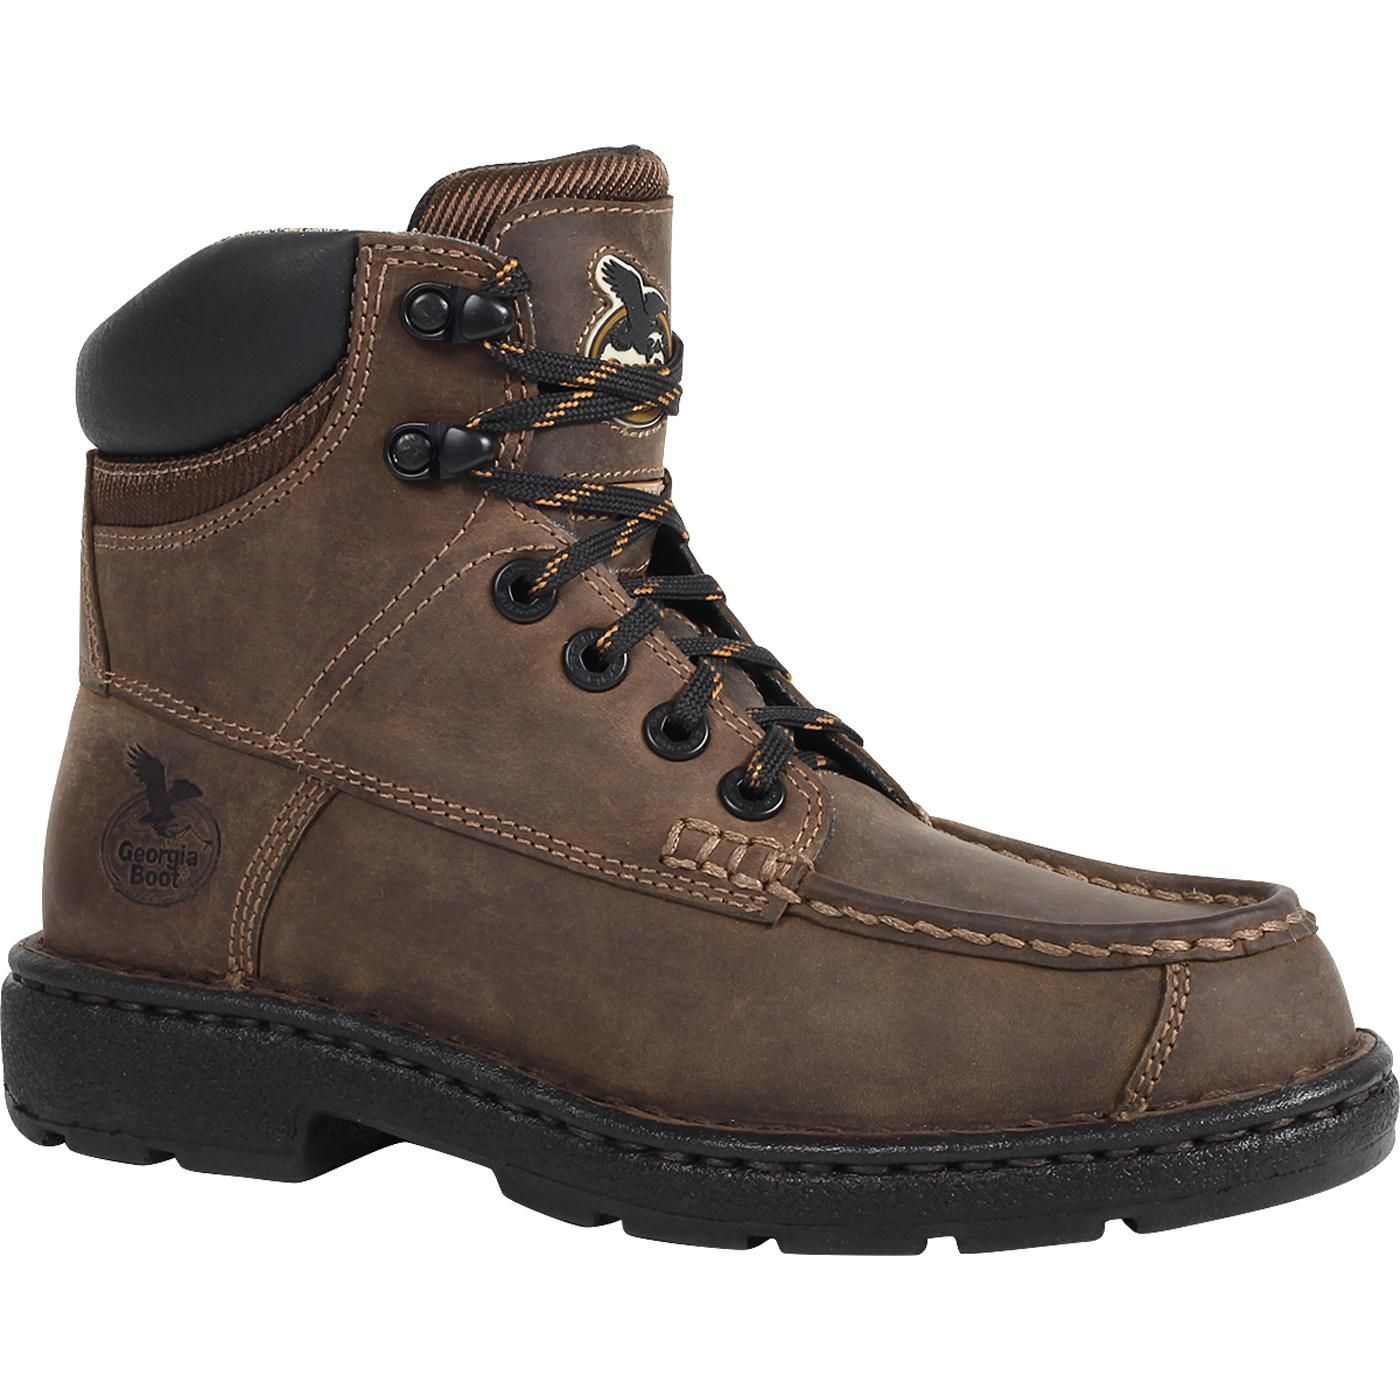 "6f81cff1191 Georgia Boot: 6"" Brown Leather Eagle Light Women's Composite-Toe ..."